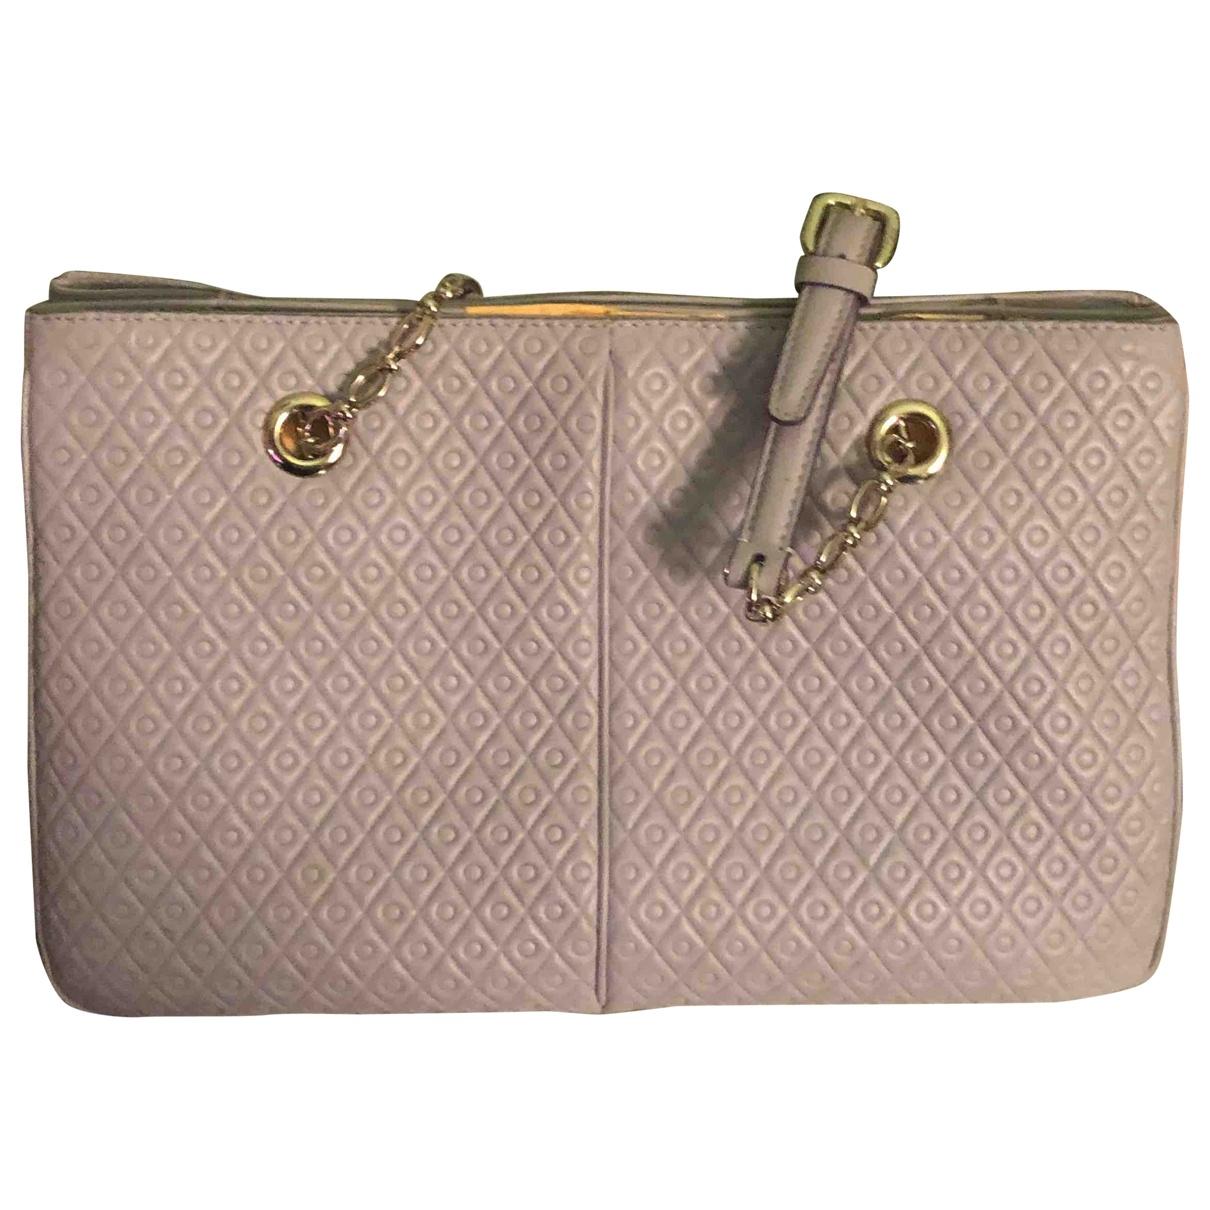 Tods \N Handtasche in  Grau Leder